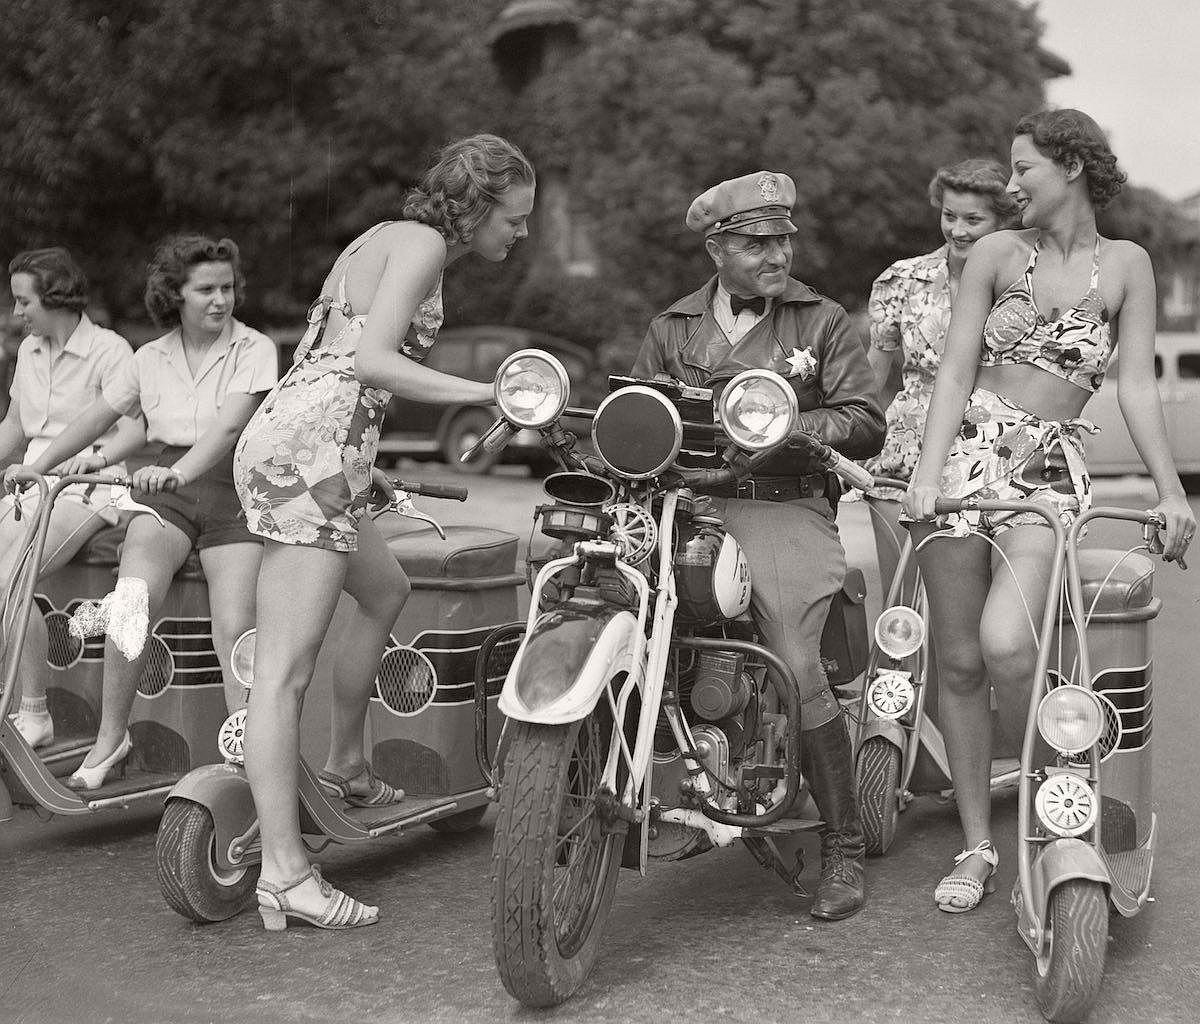 vintage-scooters-1916-1938-05